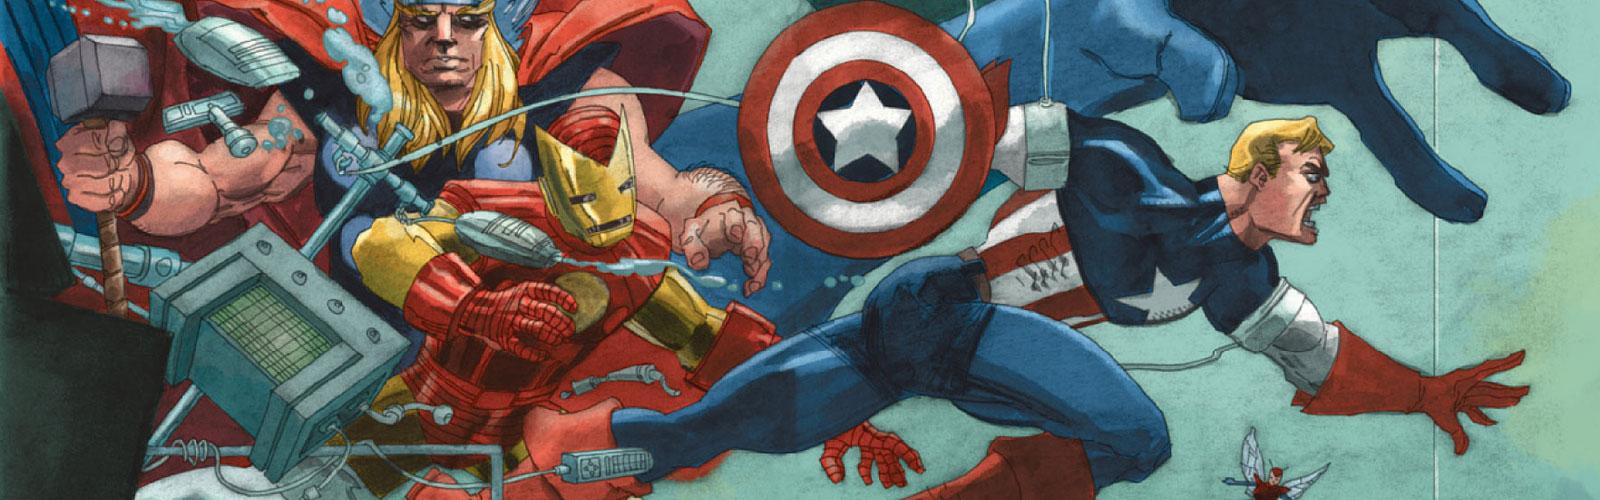 New Releases 16-09-15: Captain America - White